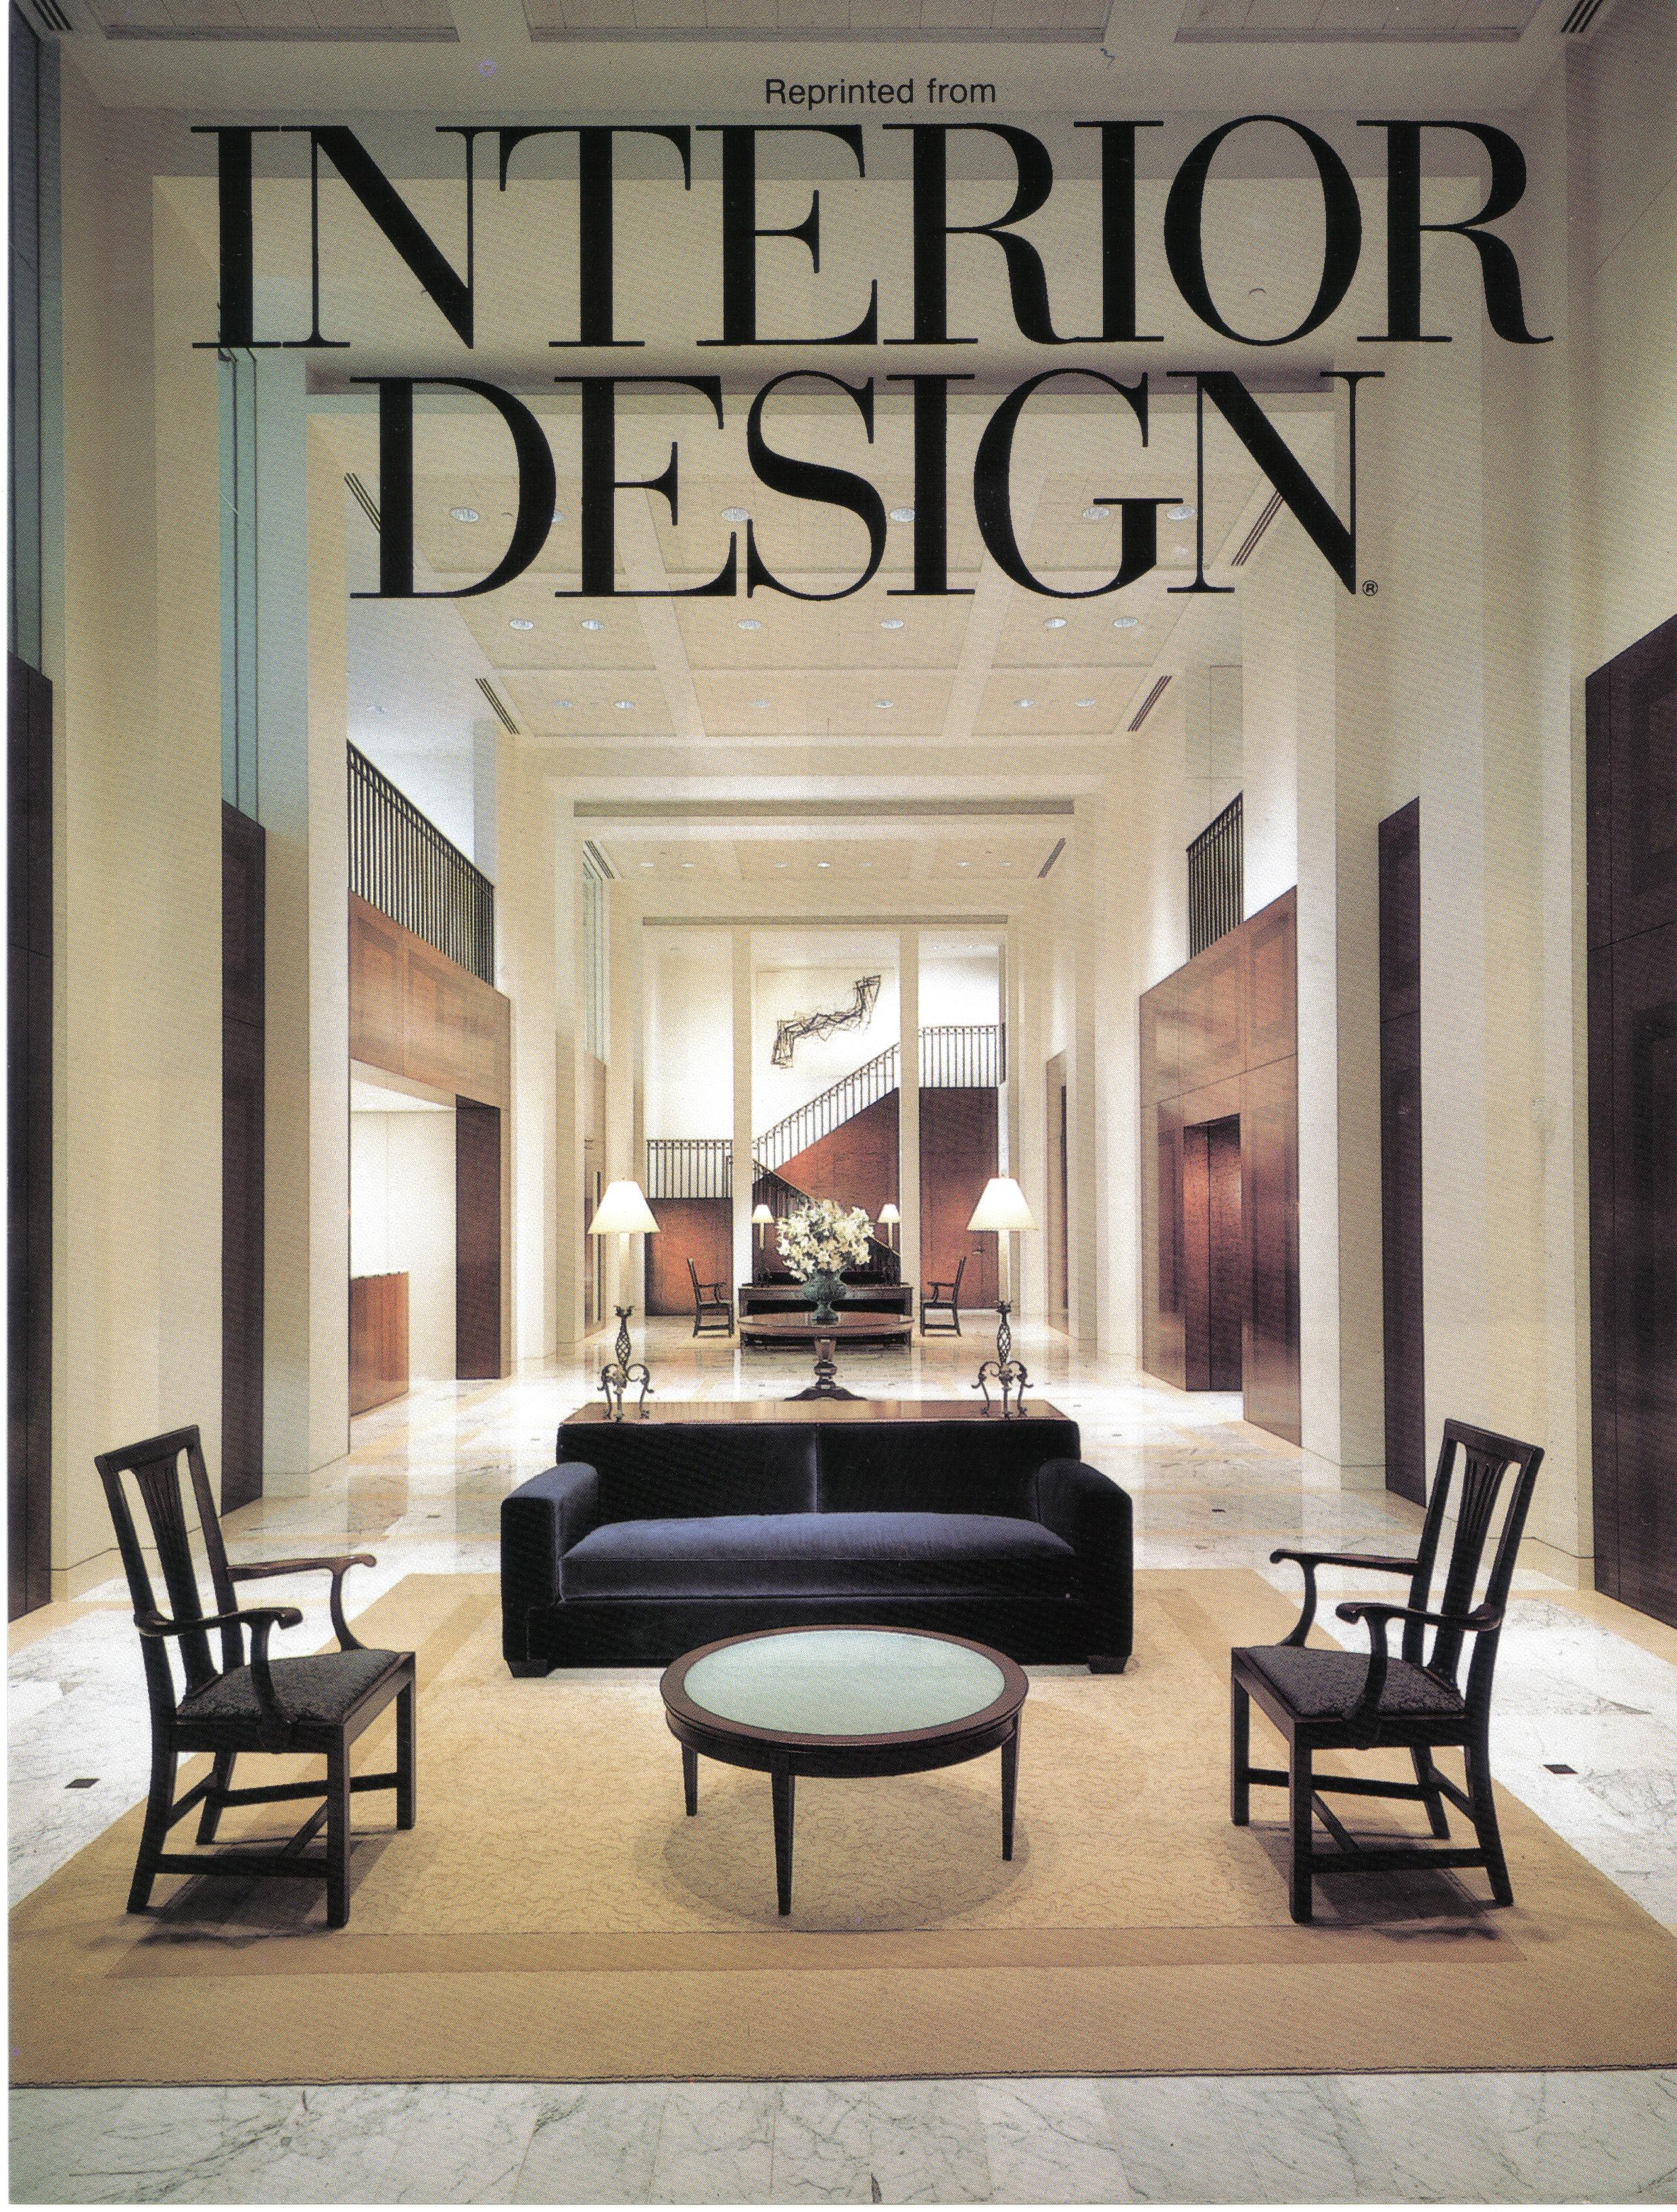 Corporate Art Installation: Price Waterhouse International Headquarters, The Americas Tower. Interior Design Magazine cover, 1994.